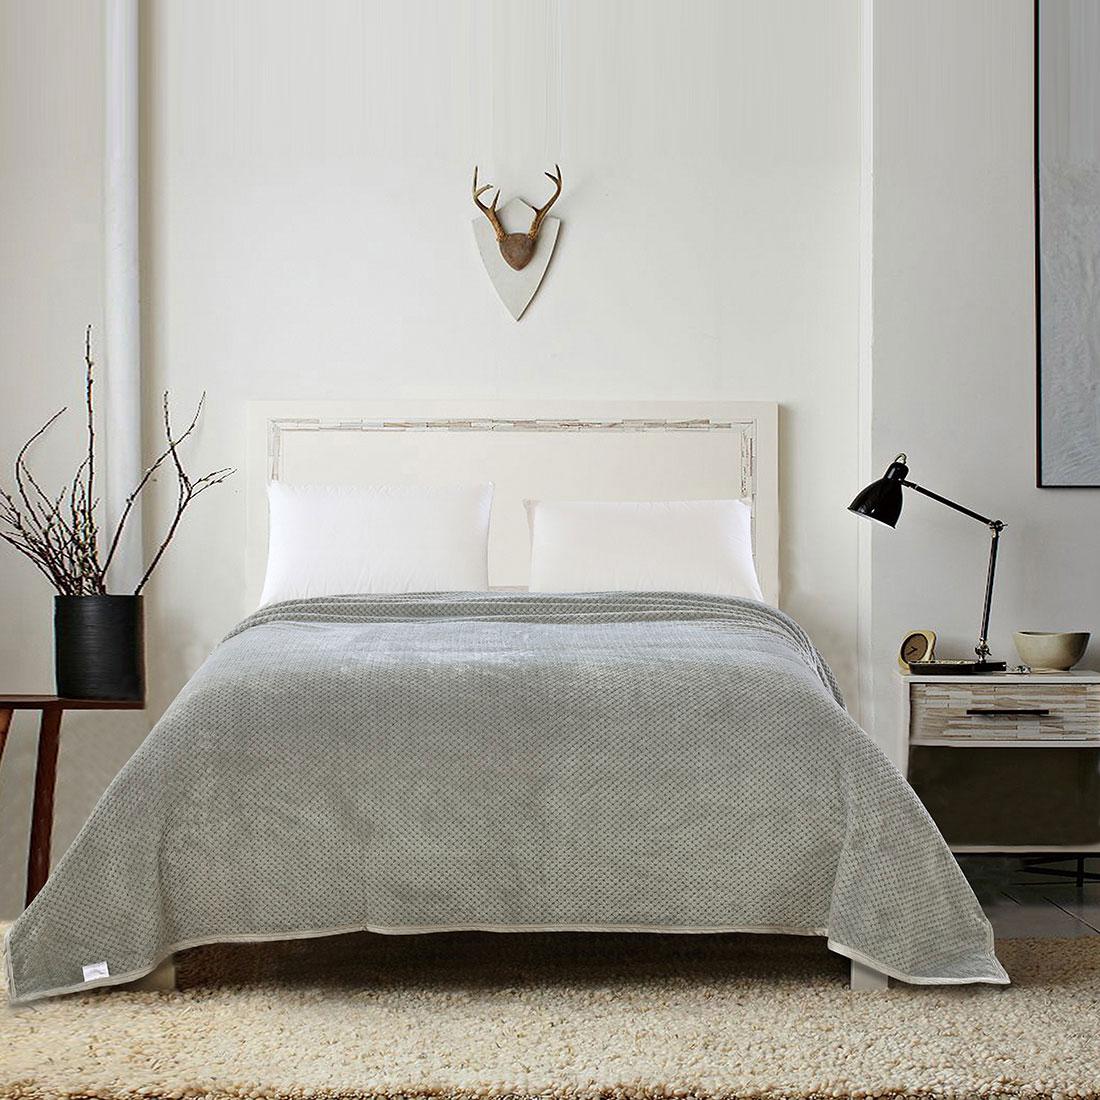 Premium Plush Throw Blanket Super soft Fleece Blanket,Twin,Full,Queen,King Size by